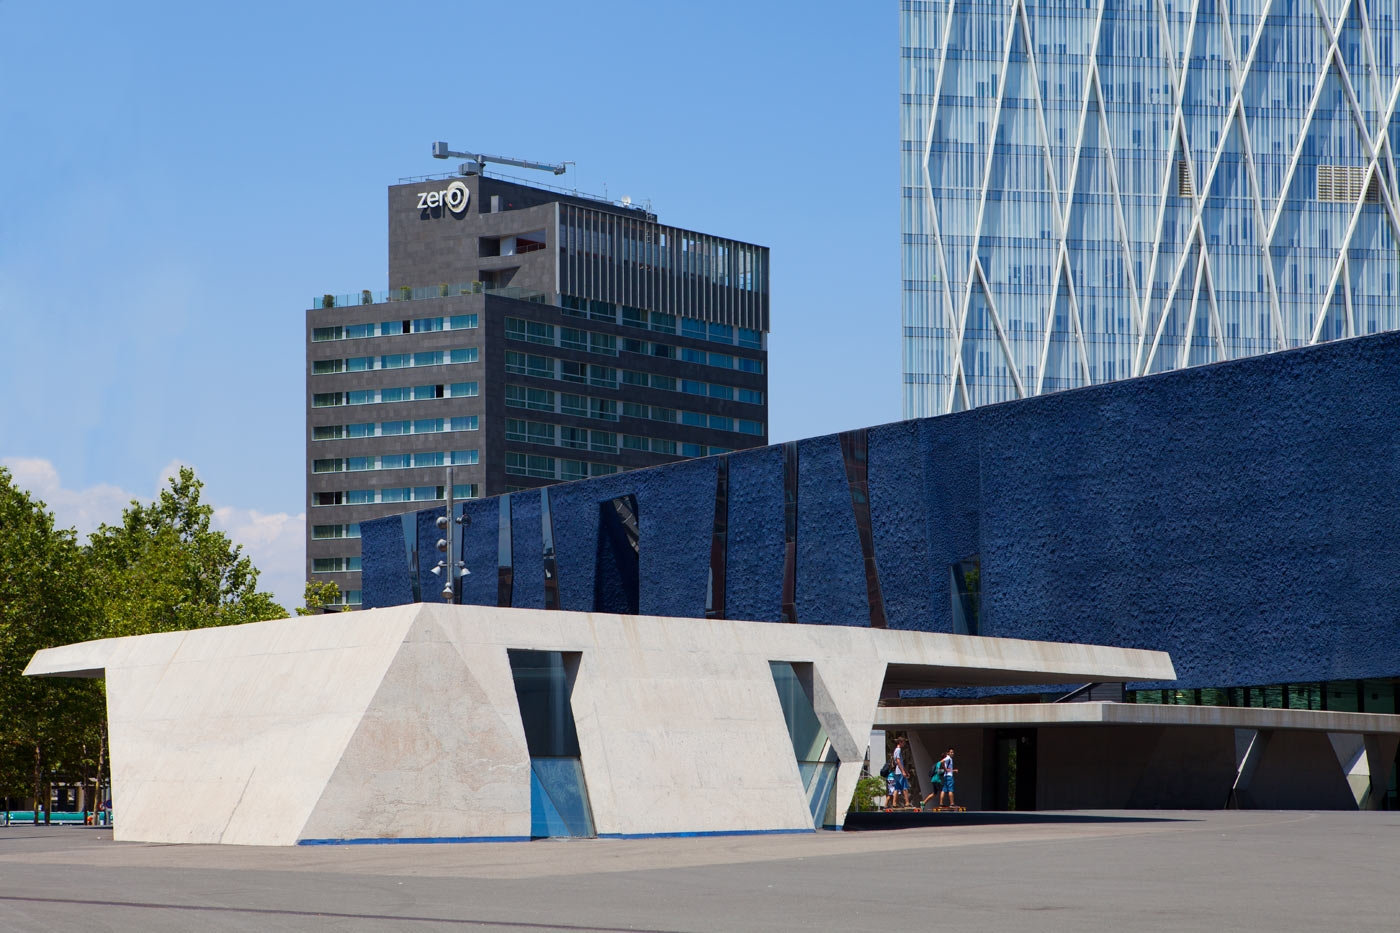 Hotel SB Diagonal Zero | City Events